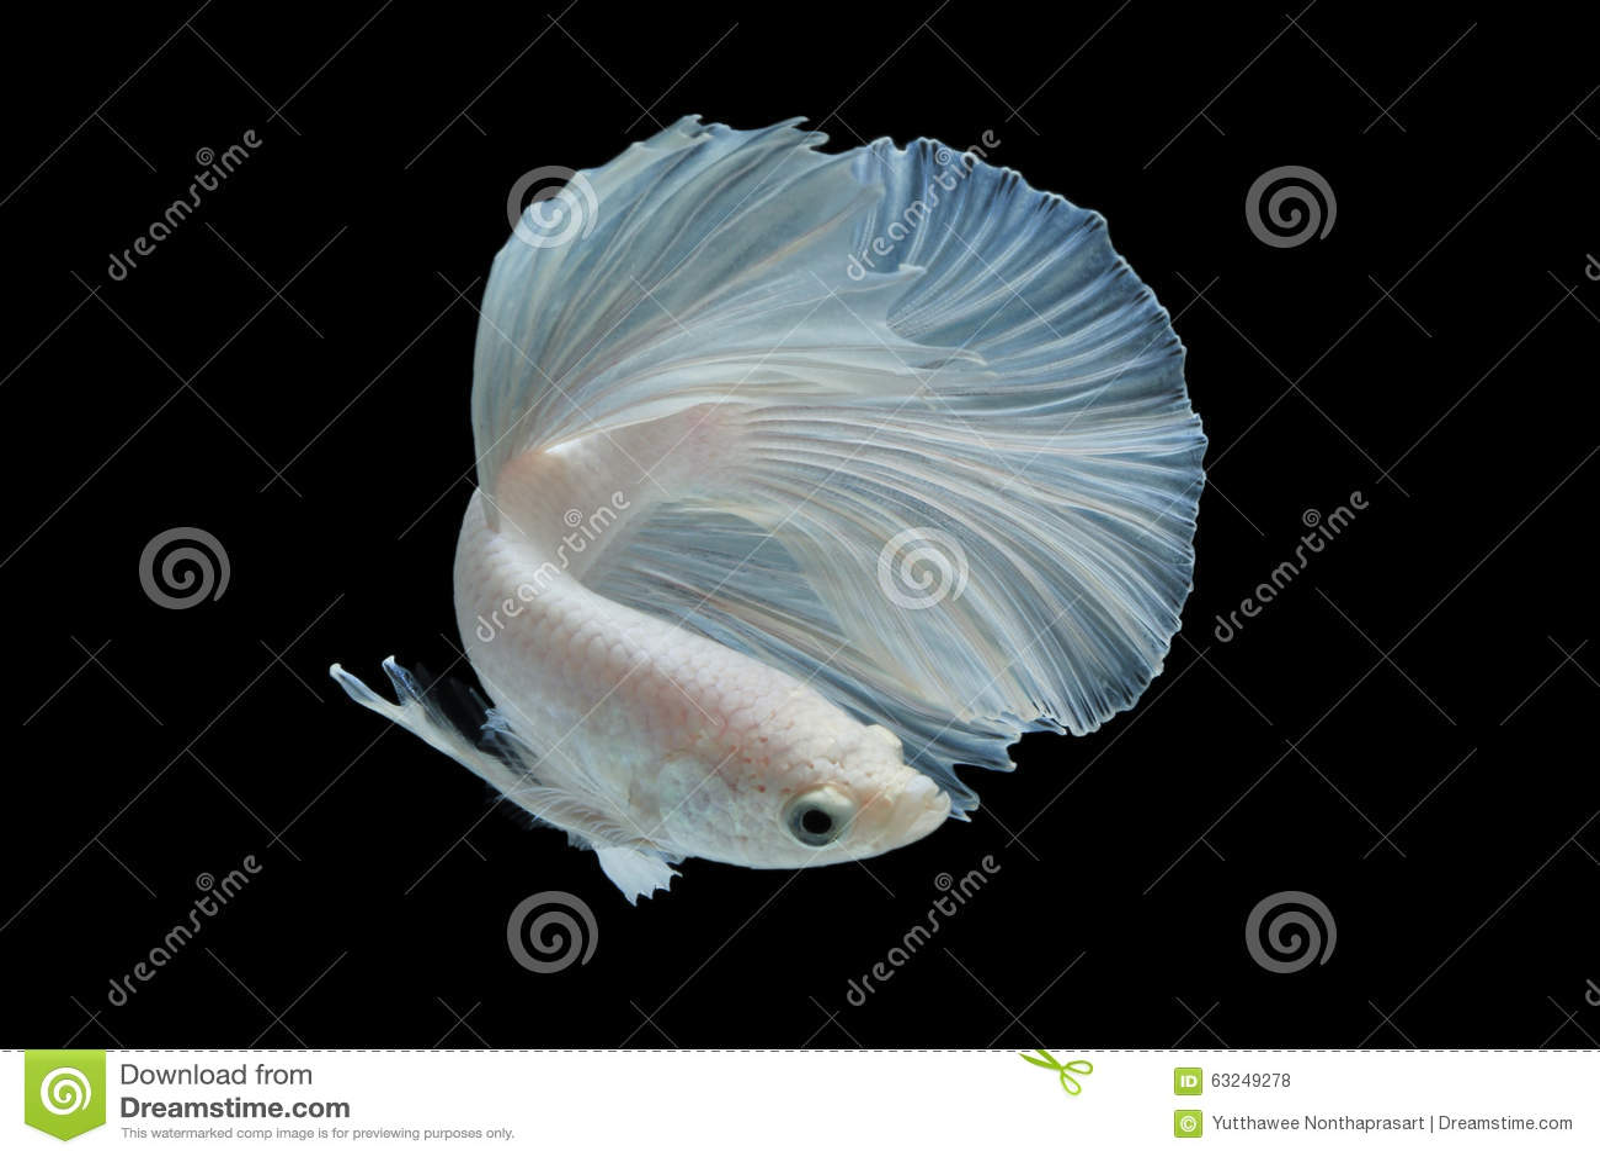 White betta fish on black background stock photo image for Black and white betta fish